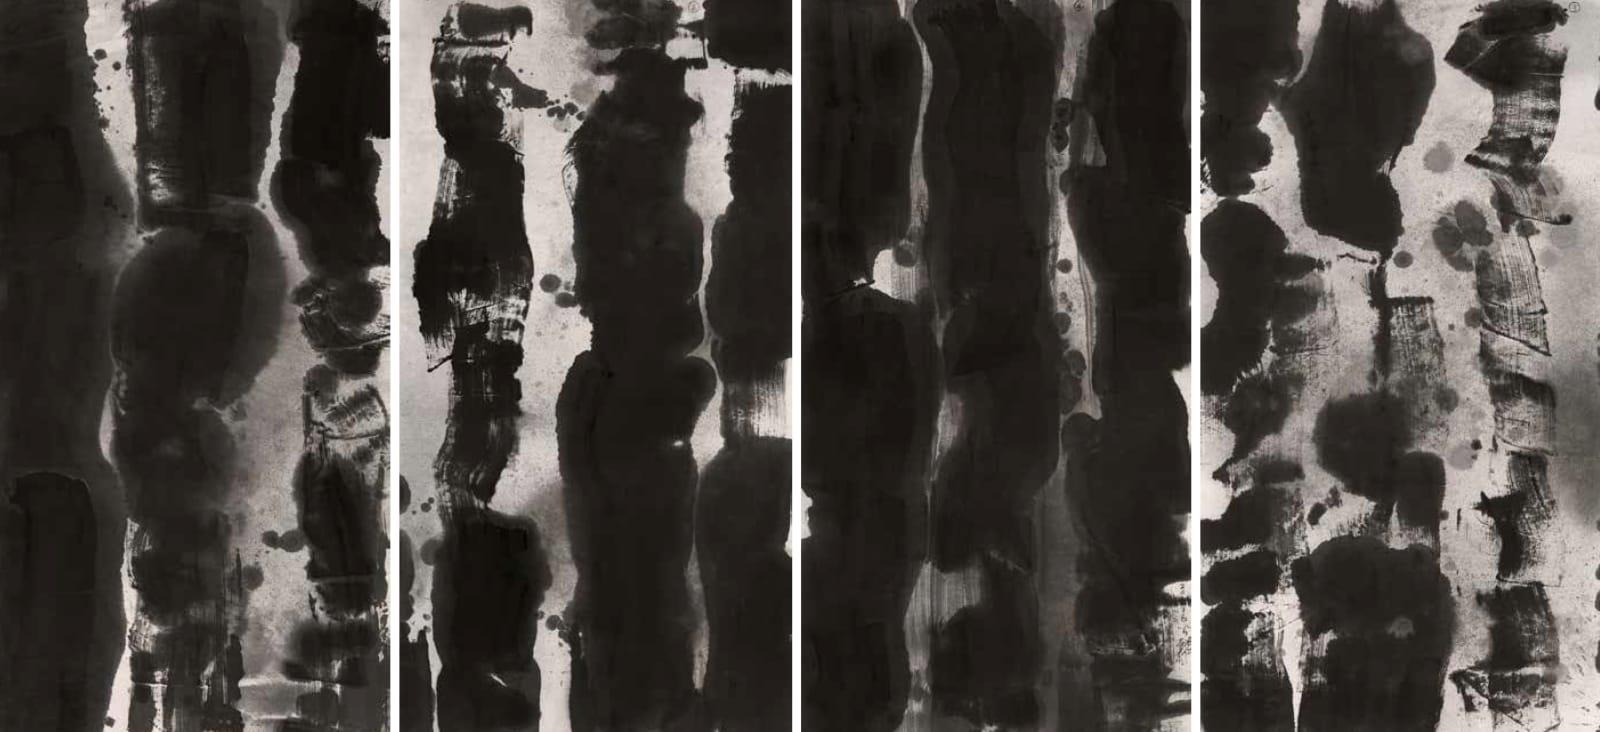 Wang Gongyi 王公懿, Rhythms 韵律, 2016